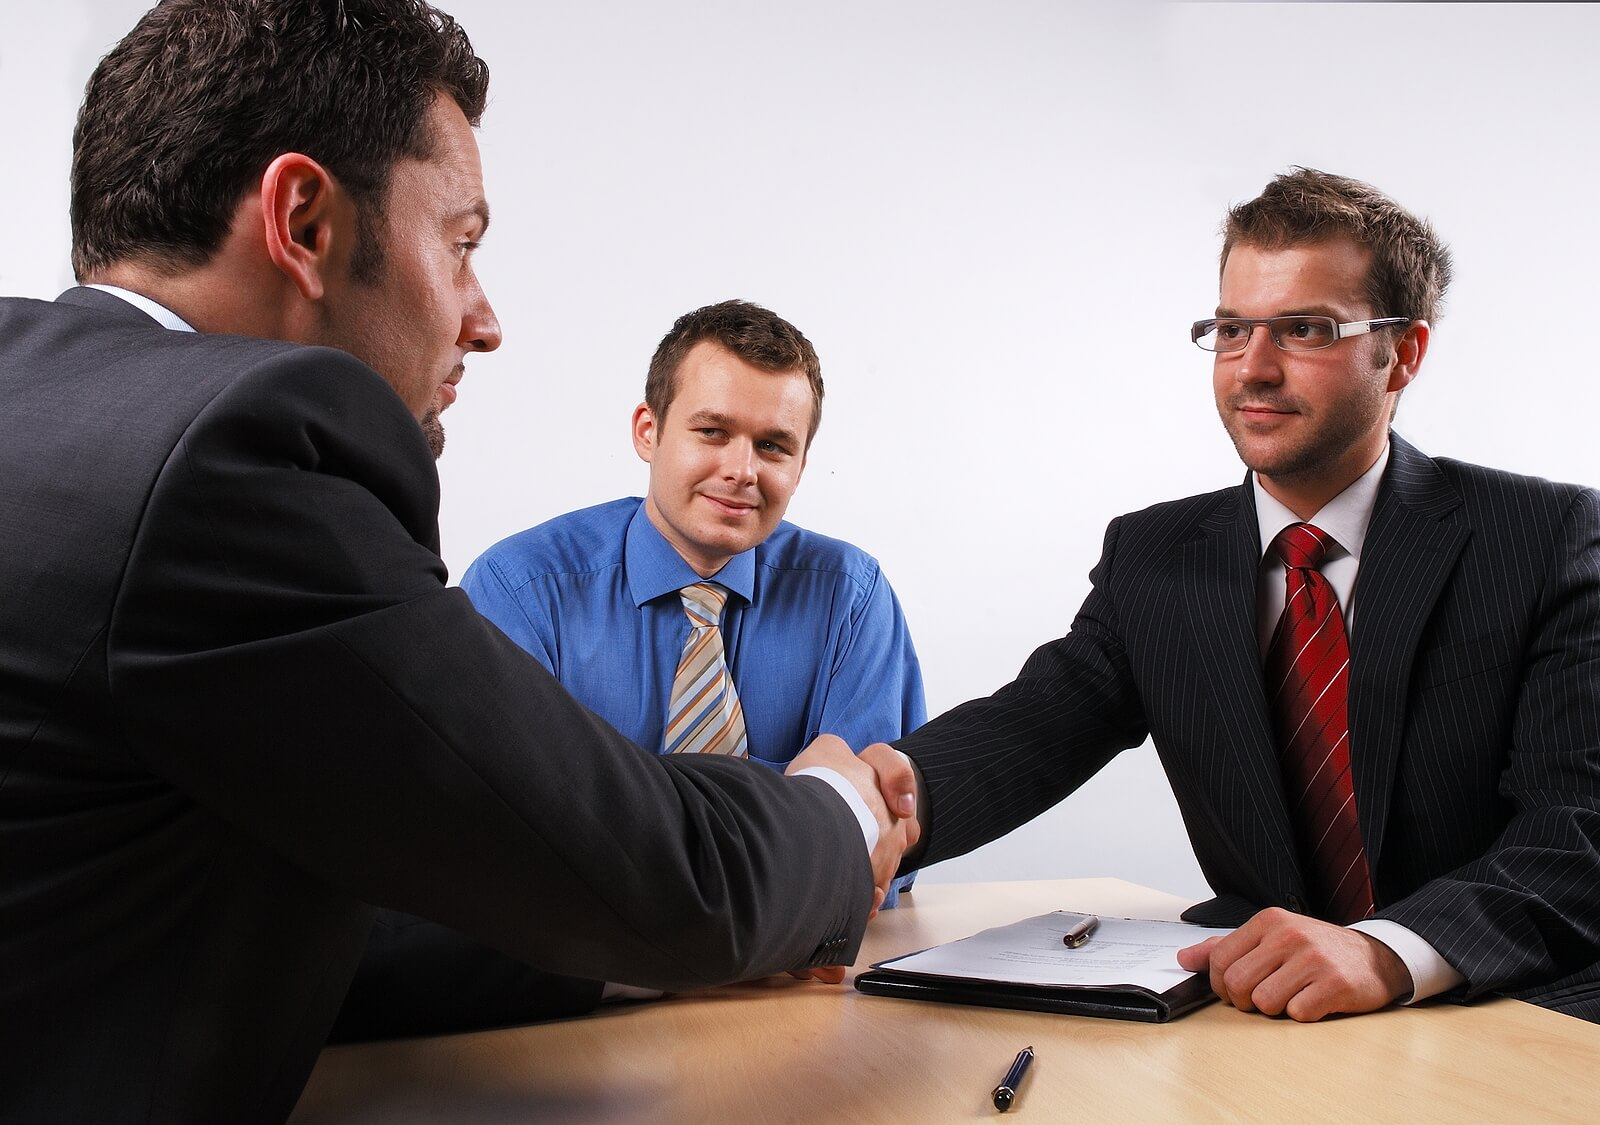 Signing Personal Injury Loans